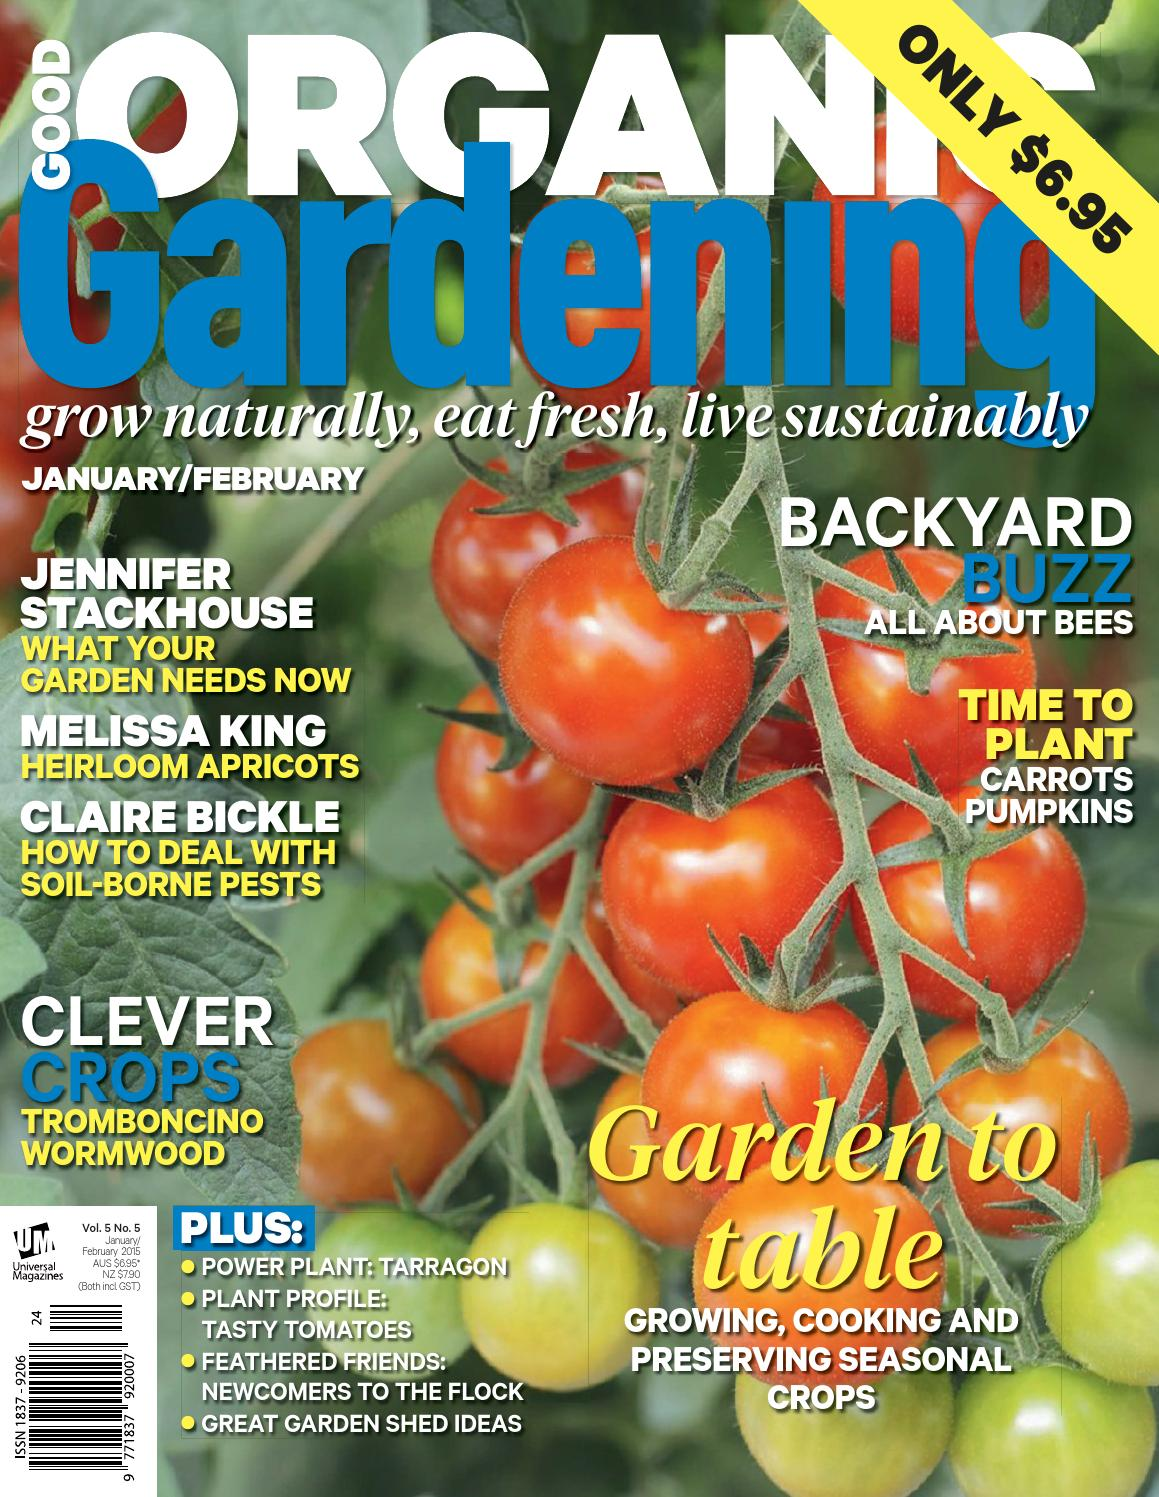 Seeds Peas 6 Weeks Ultra-early Giant Vegetable Organic Heirloom NON-GMO